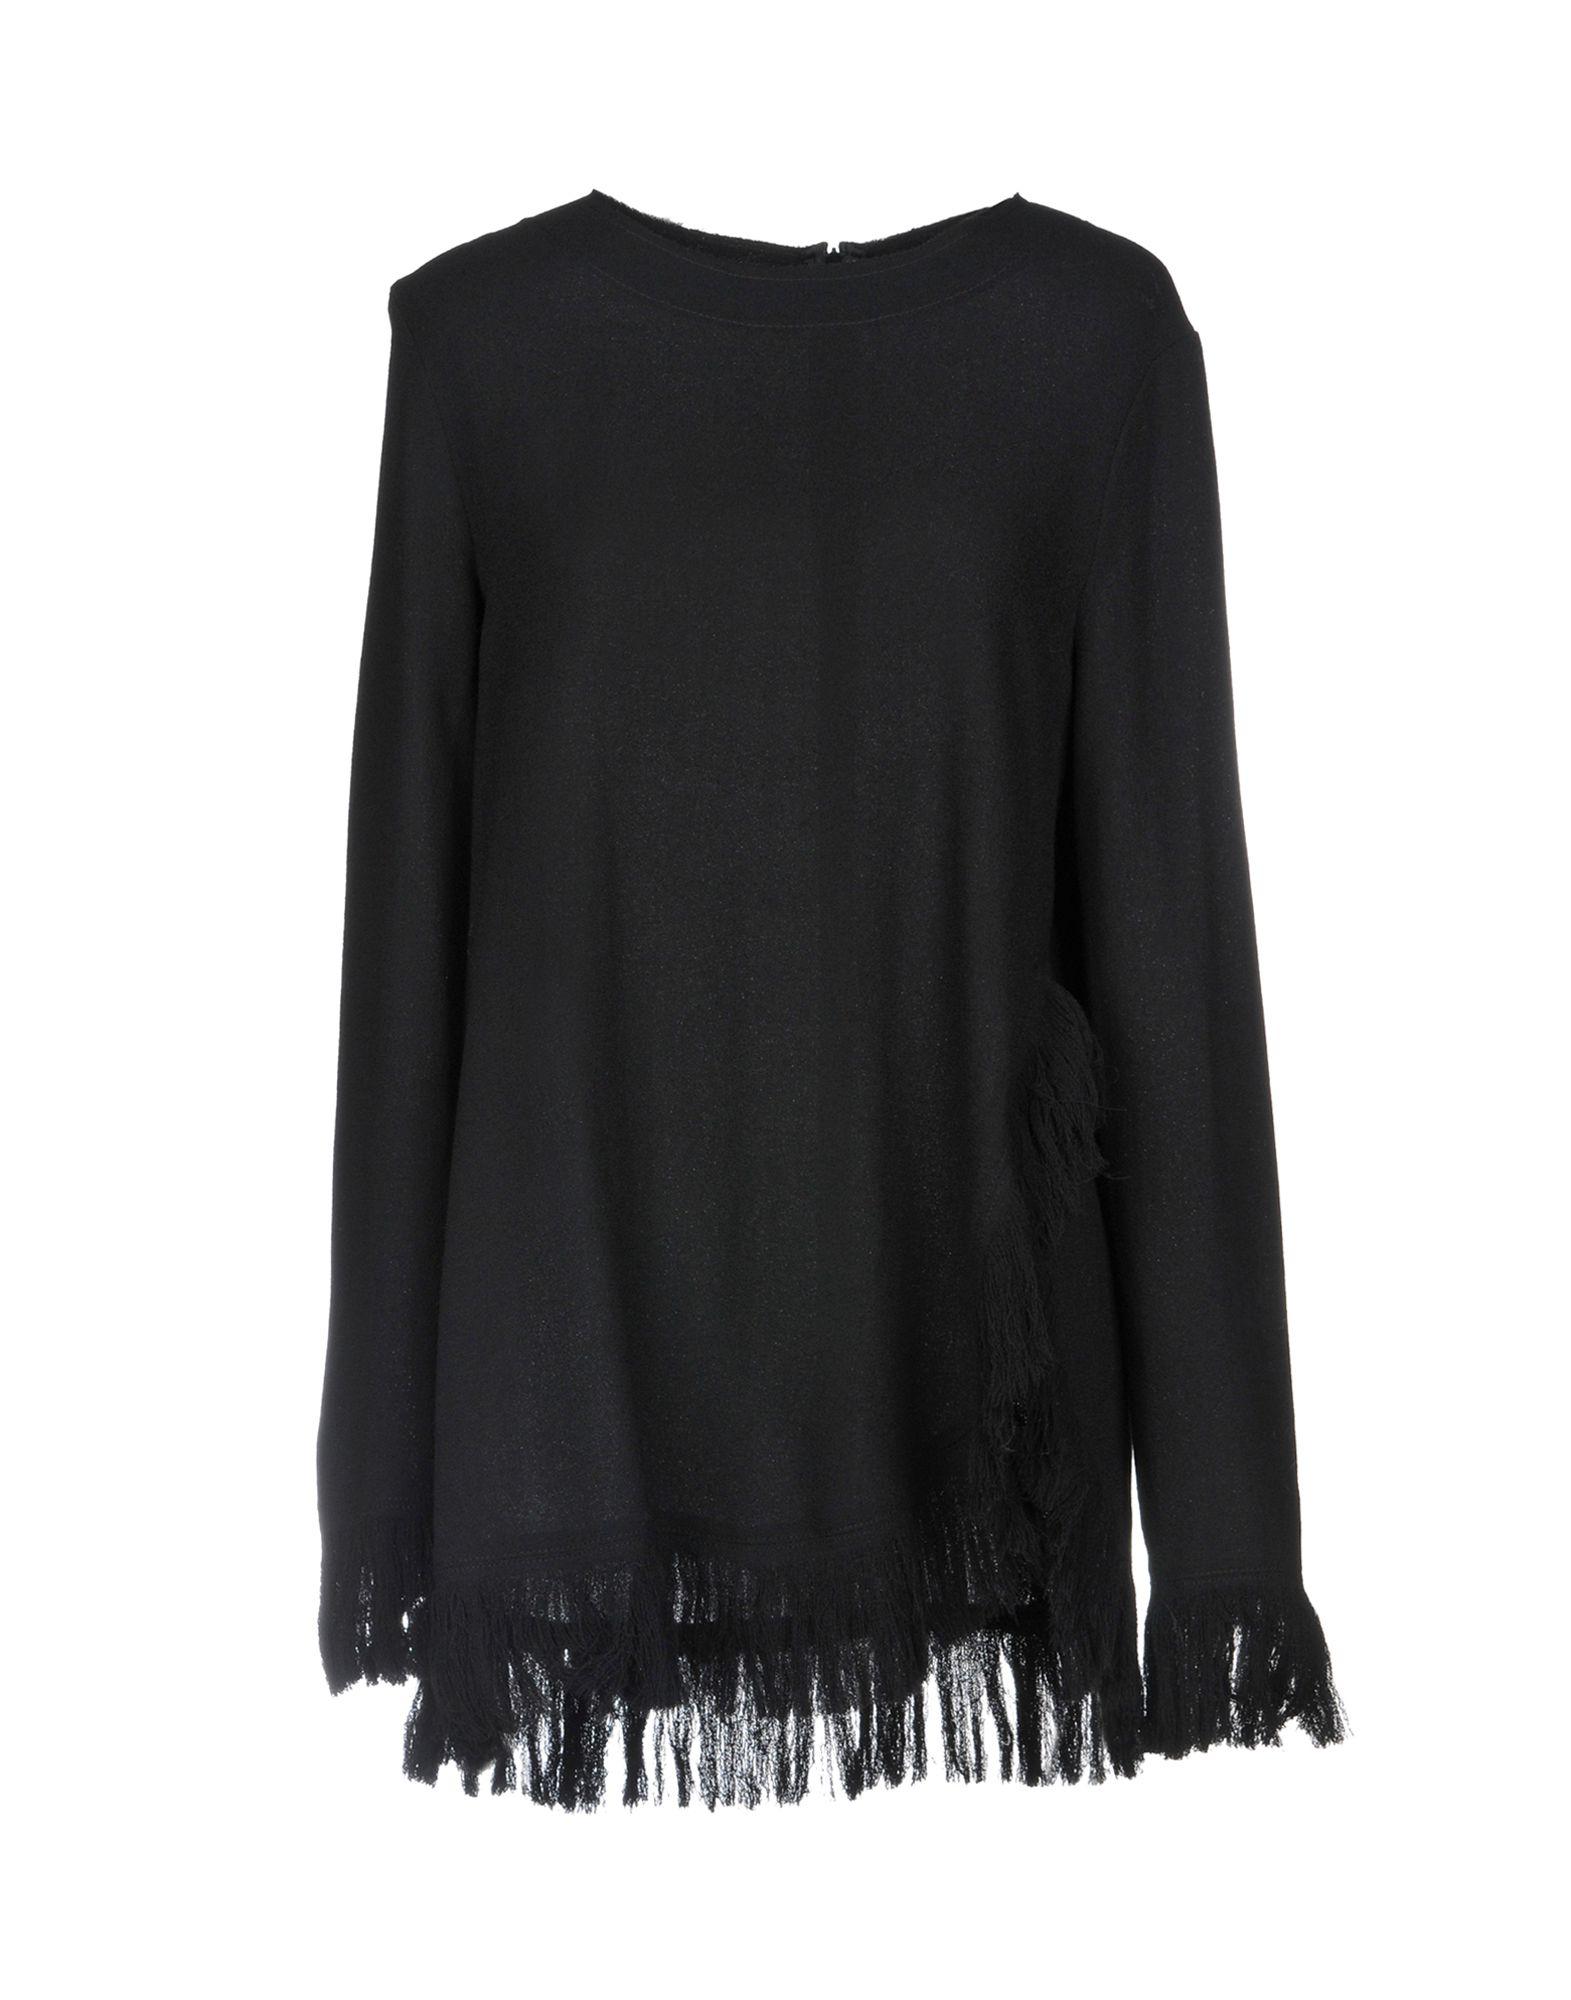 VERONIQUE LEROY Blouses in Black